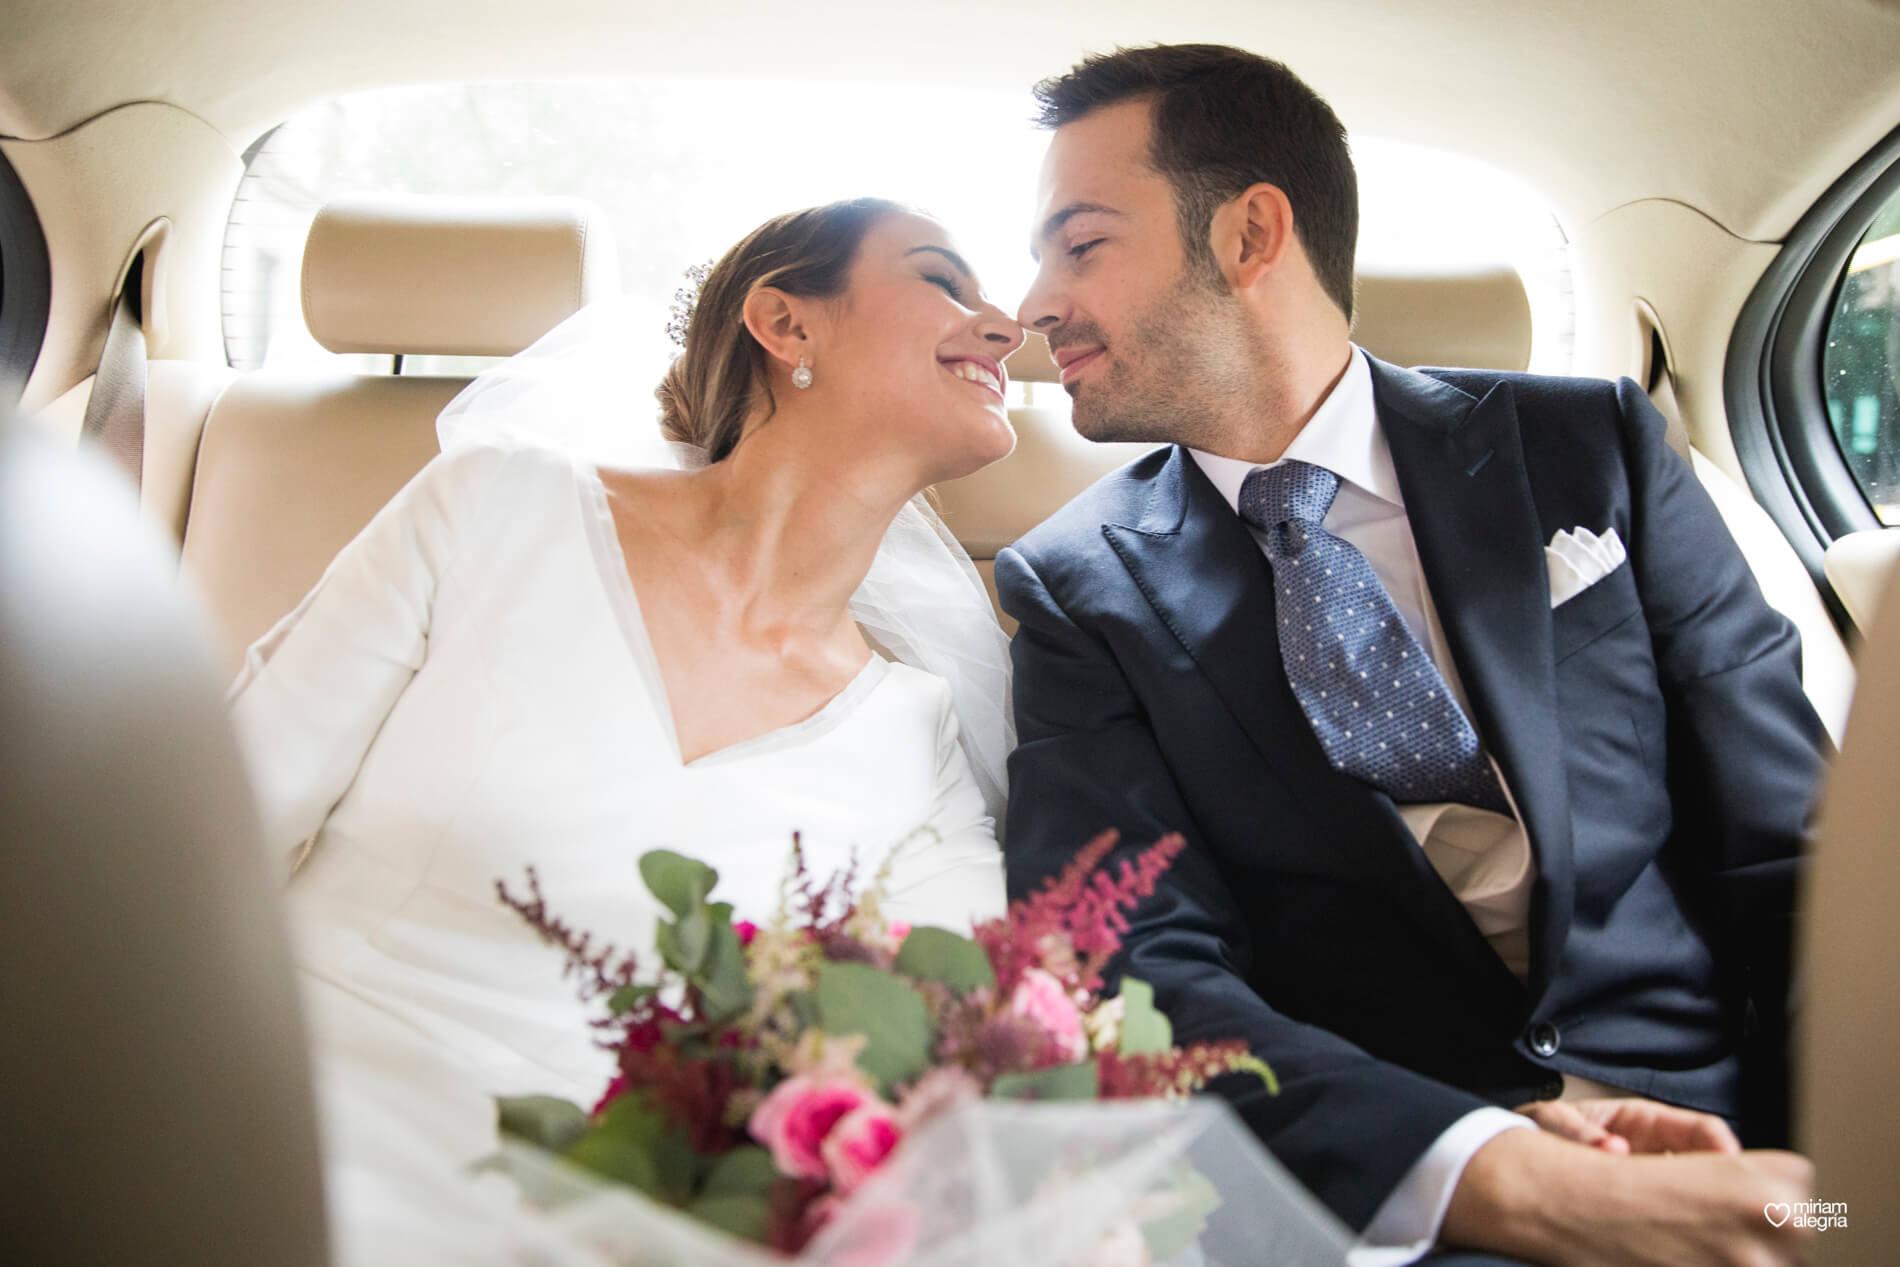 vestido-de-novia-paula-del-vas-miriam-alegria-fotografos-boda-murcia-79